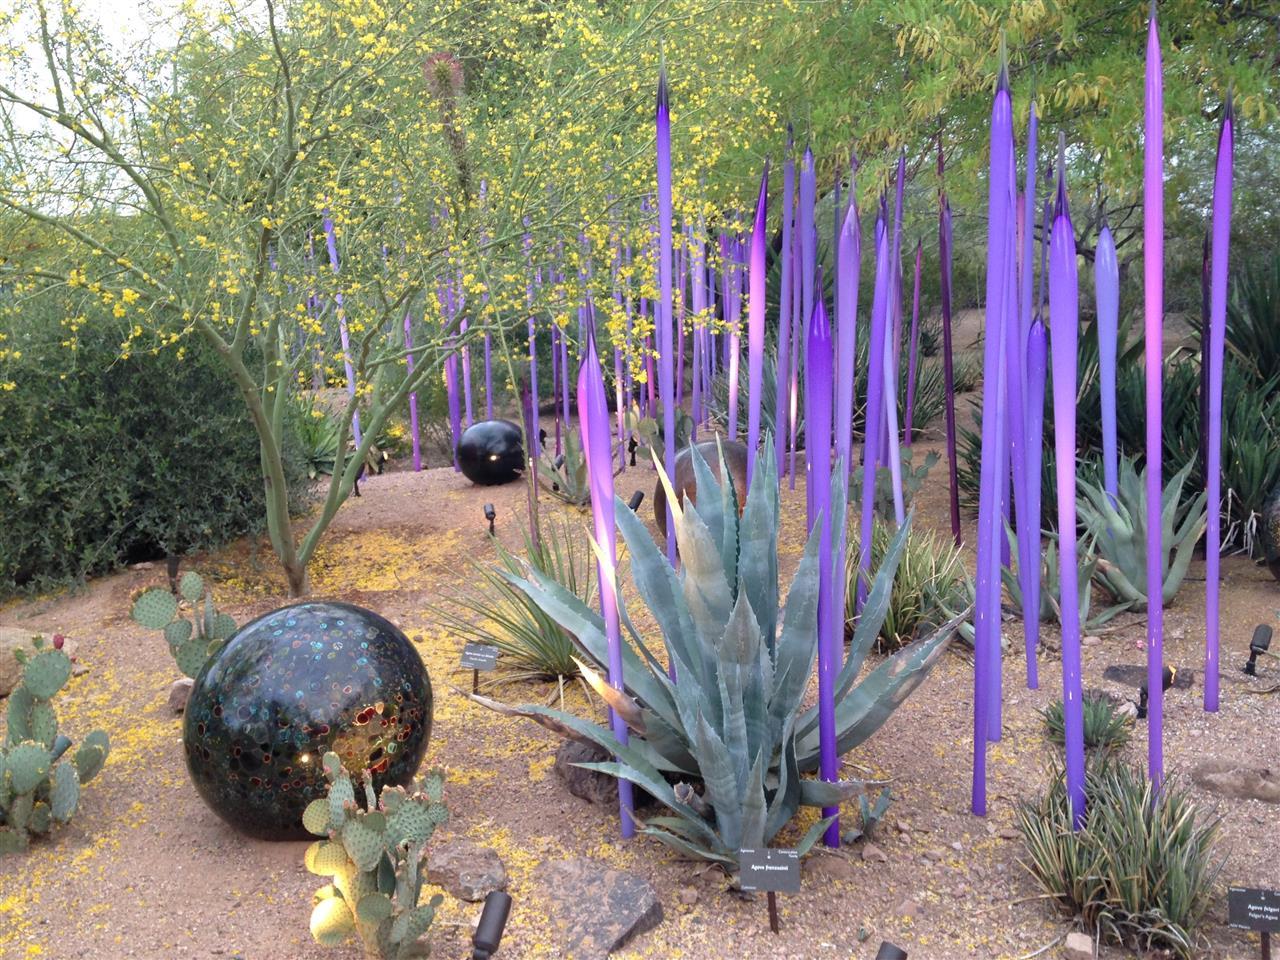 Desert Botanical Garden Phoenix, AZ Chihuly Exhibit